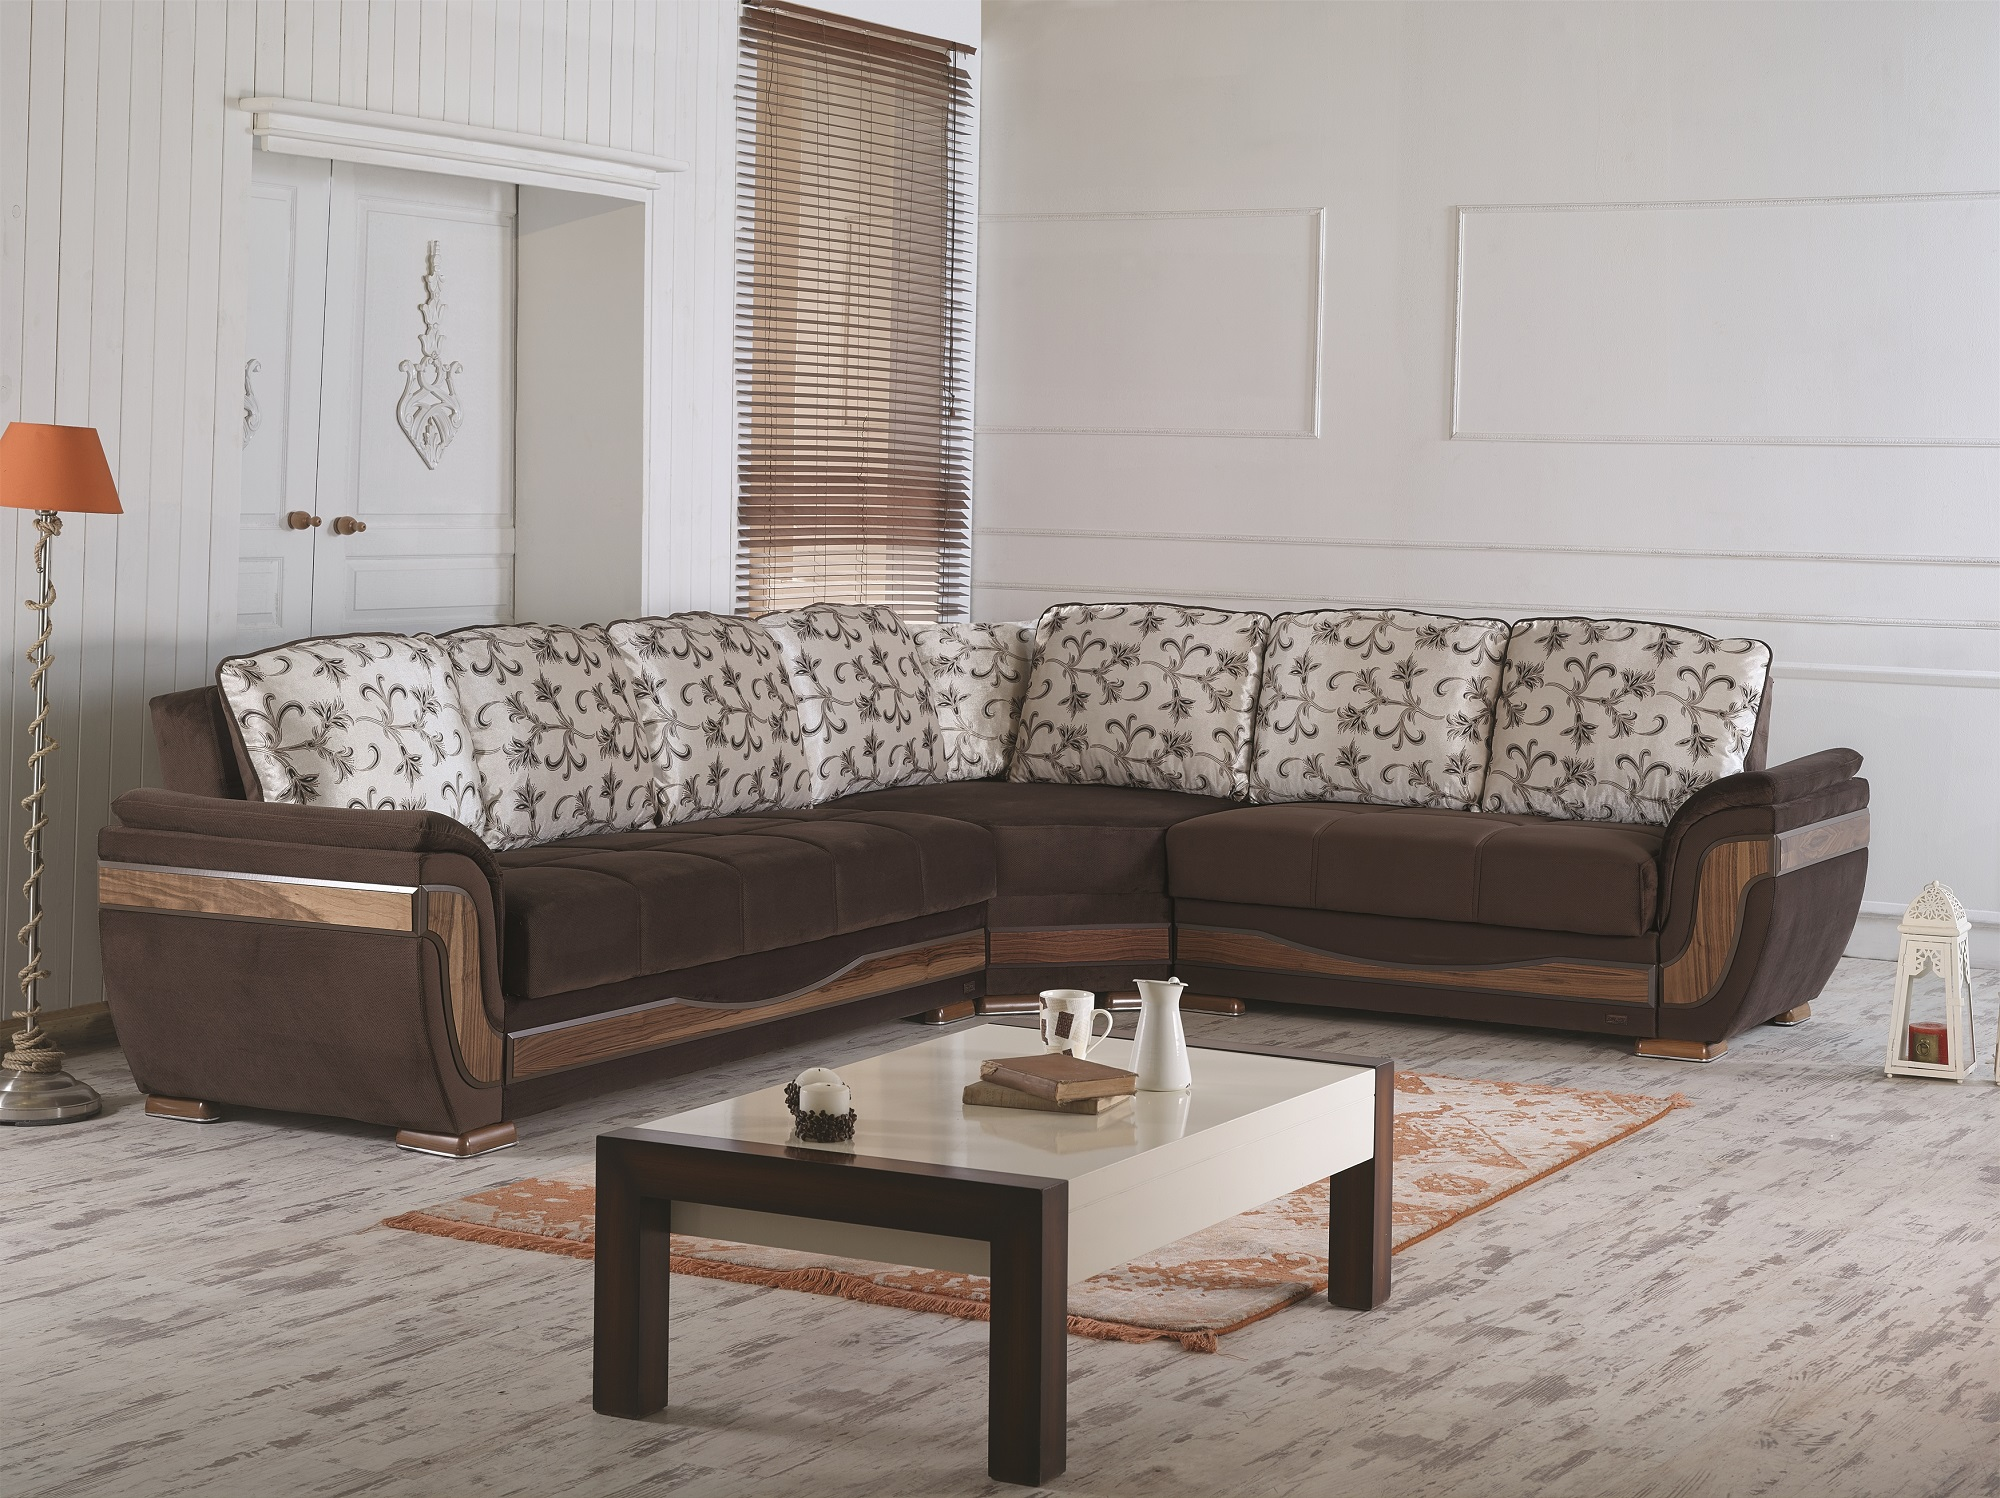 Isingtec Kok Usa 5081b Leather Sectional Sofa Sectional Sofa